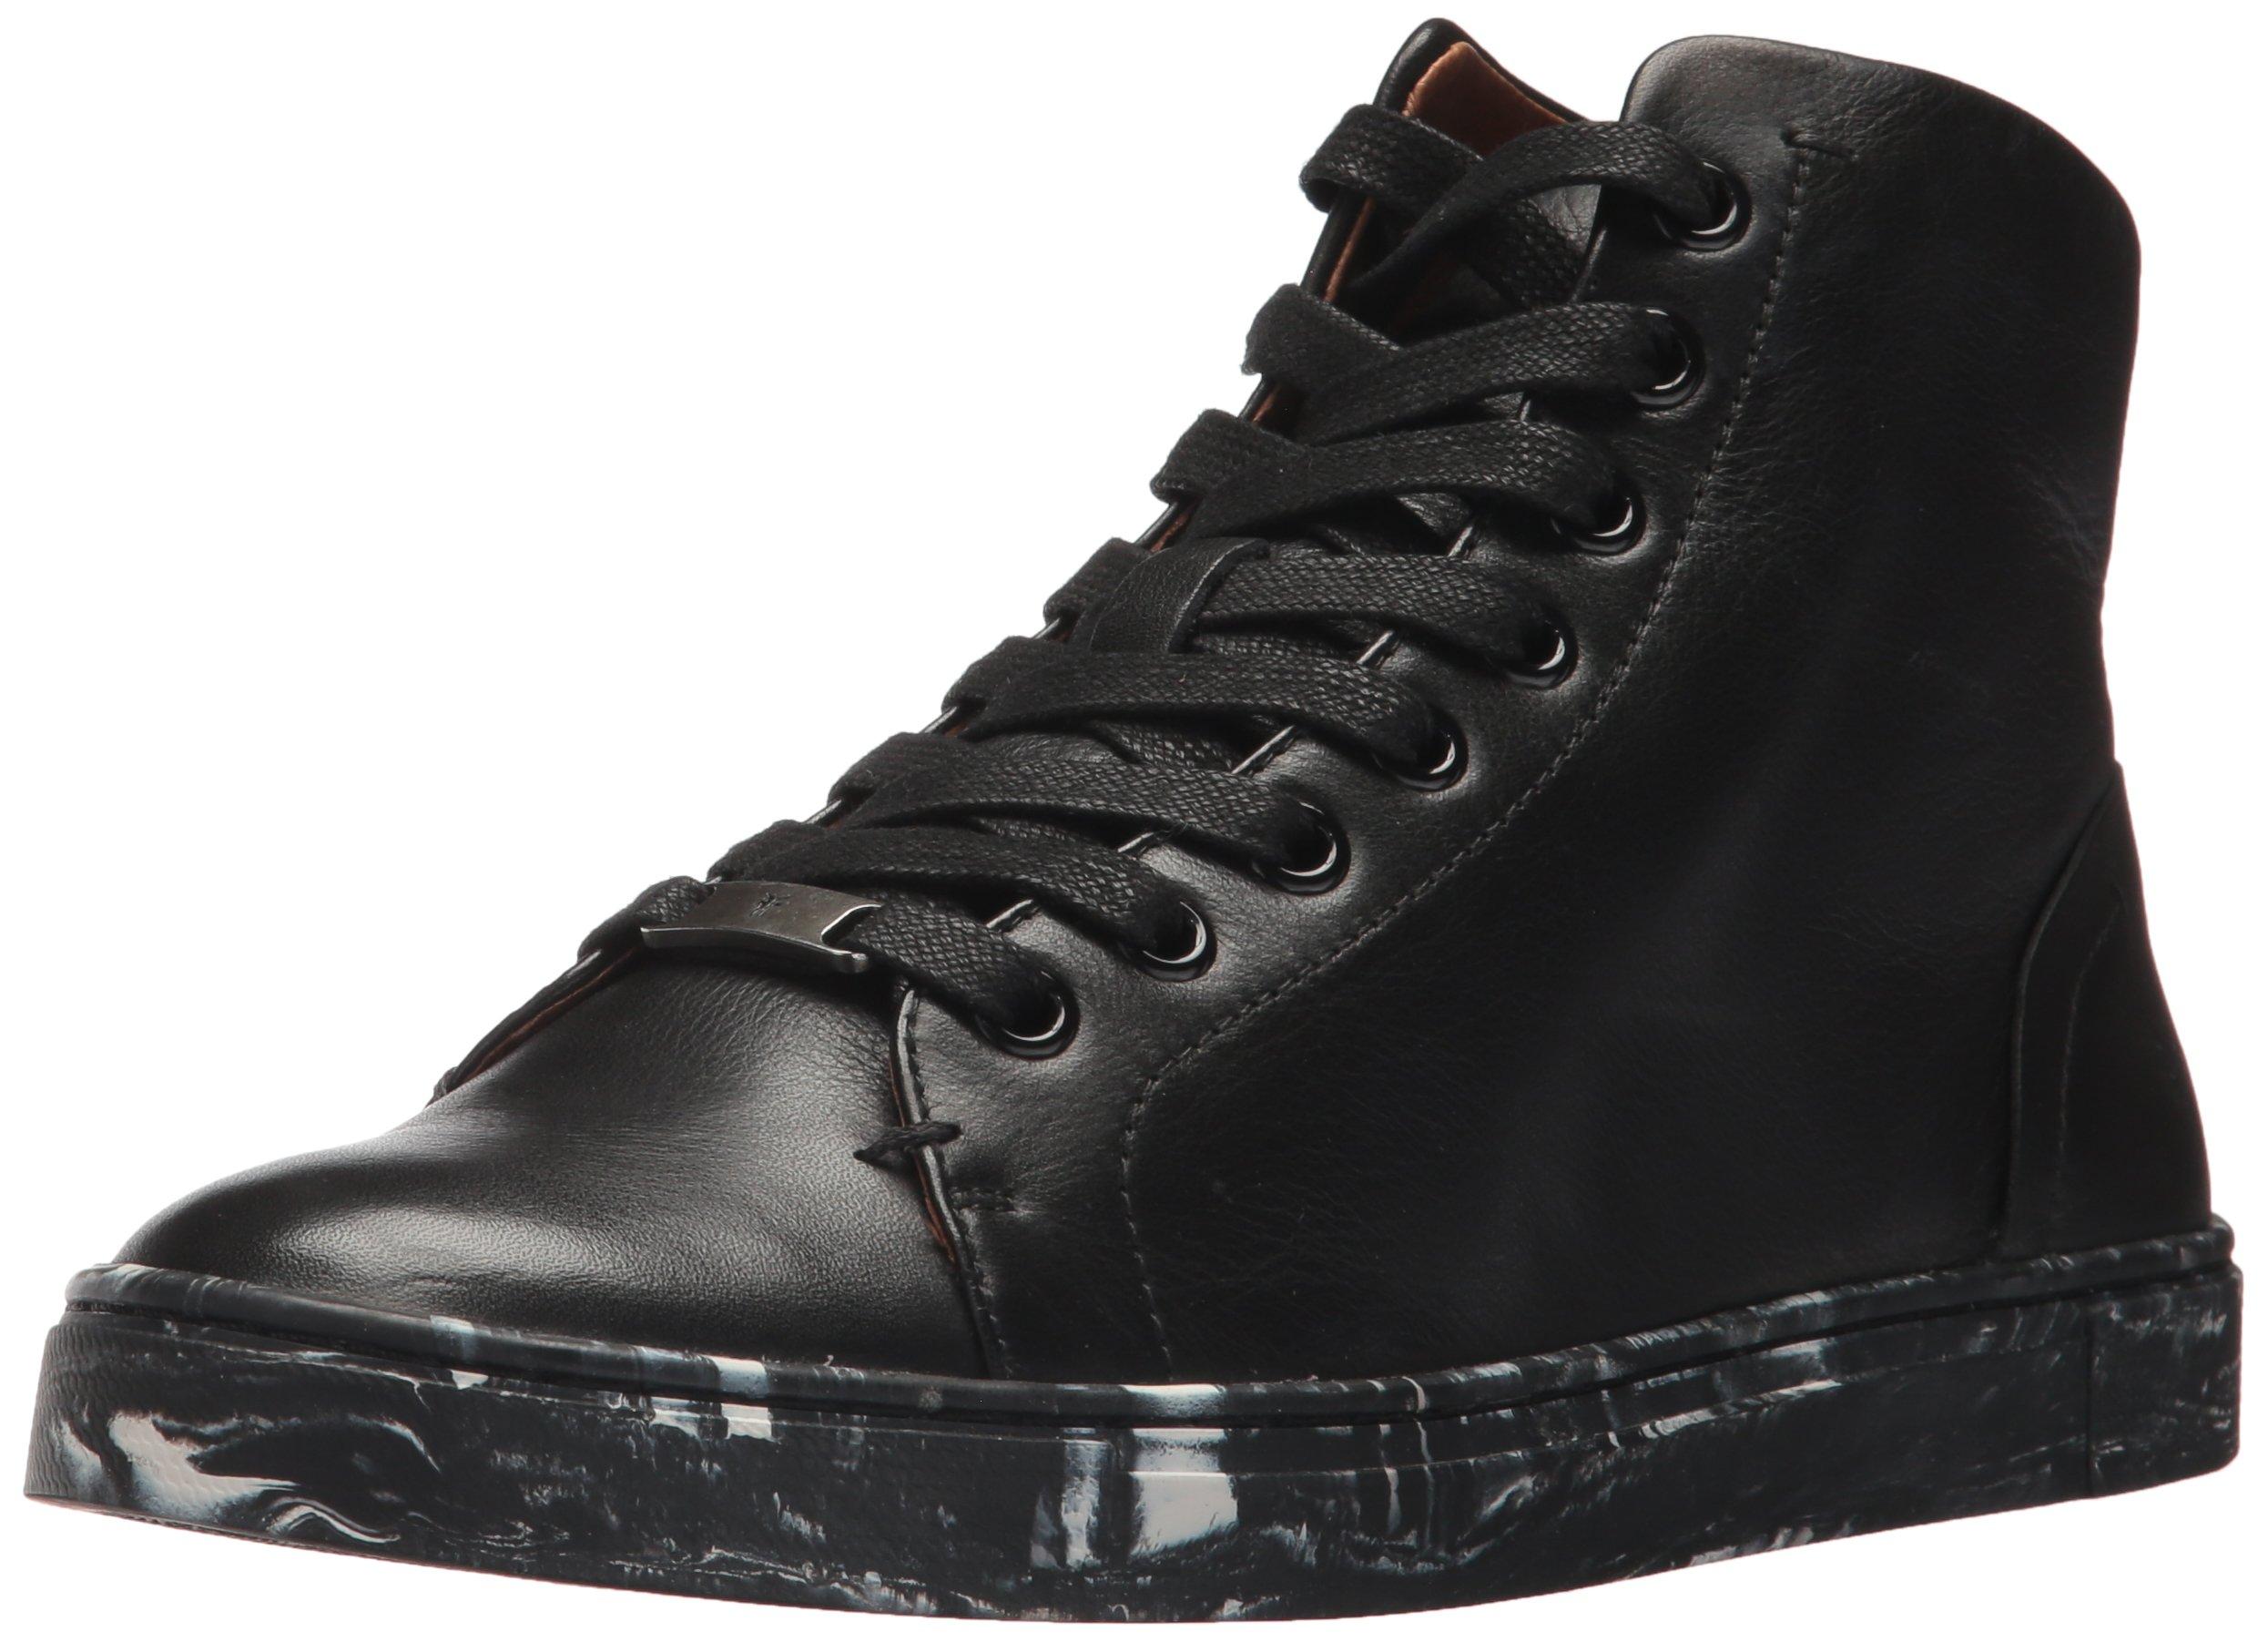 FRYE Women's IVY High Top Sneaker, Black, 9 M US